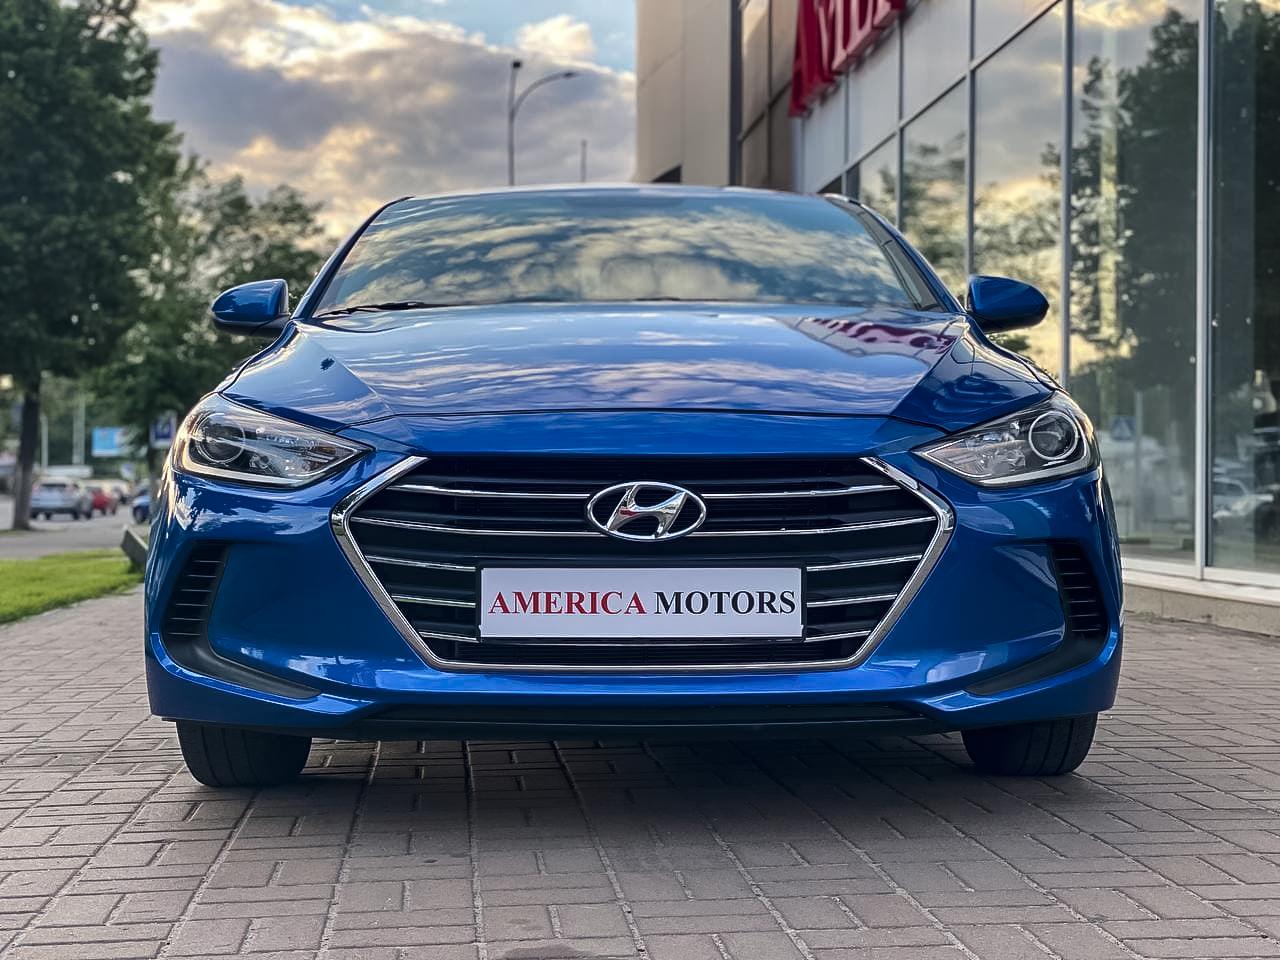 2017 Hyundai ELANTRA | Vin: KMHD74LF5JU606582